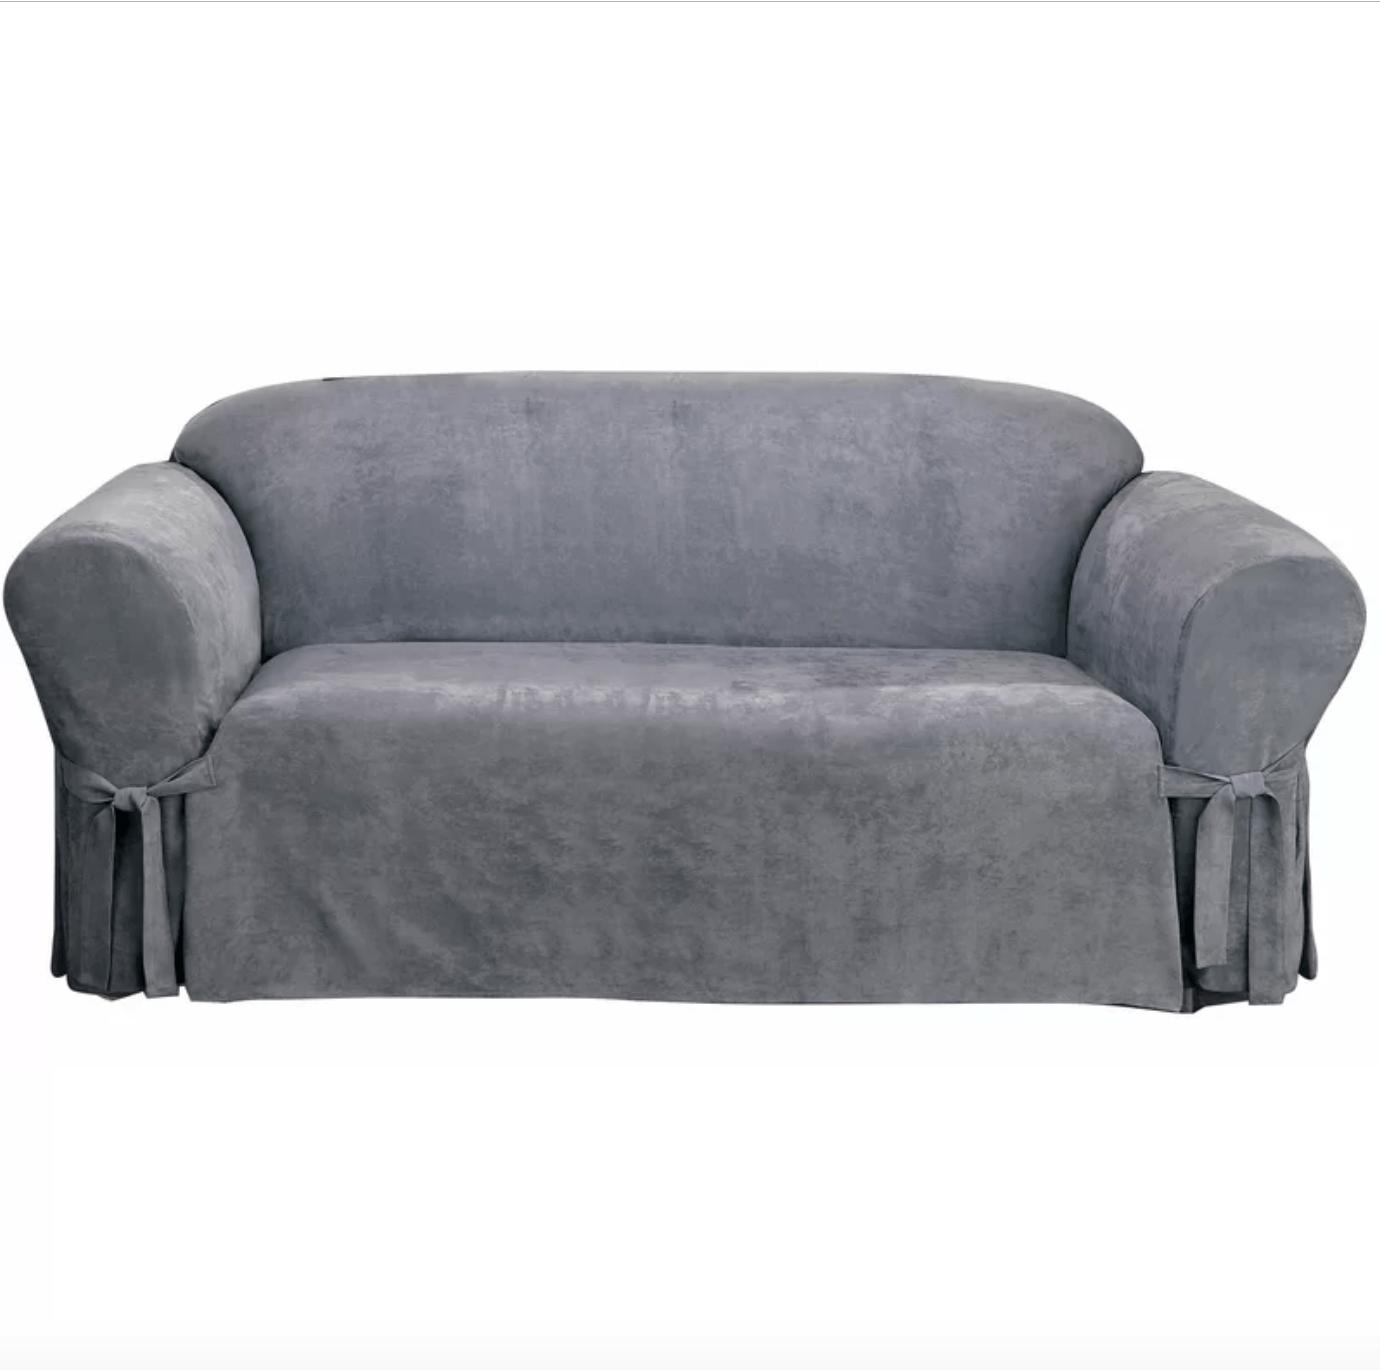 soft suede furniture box cushion sofa slipcover